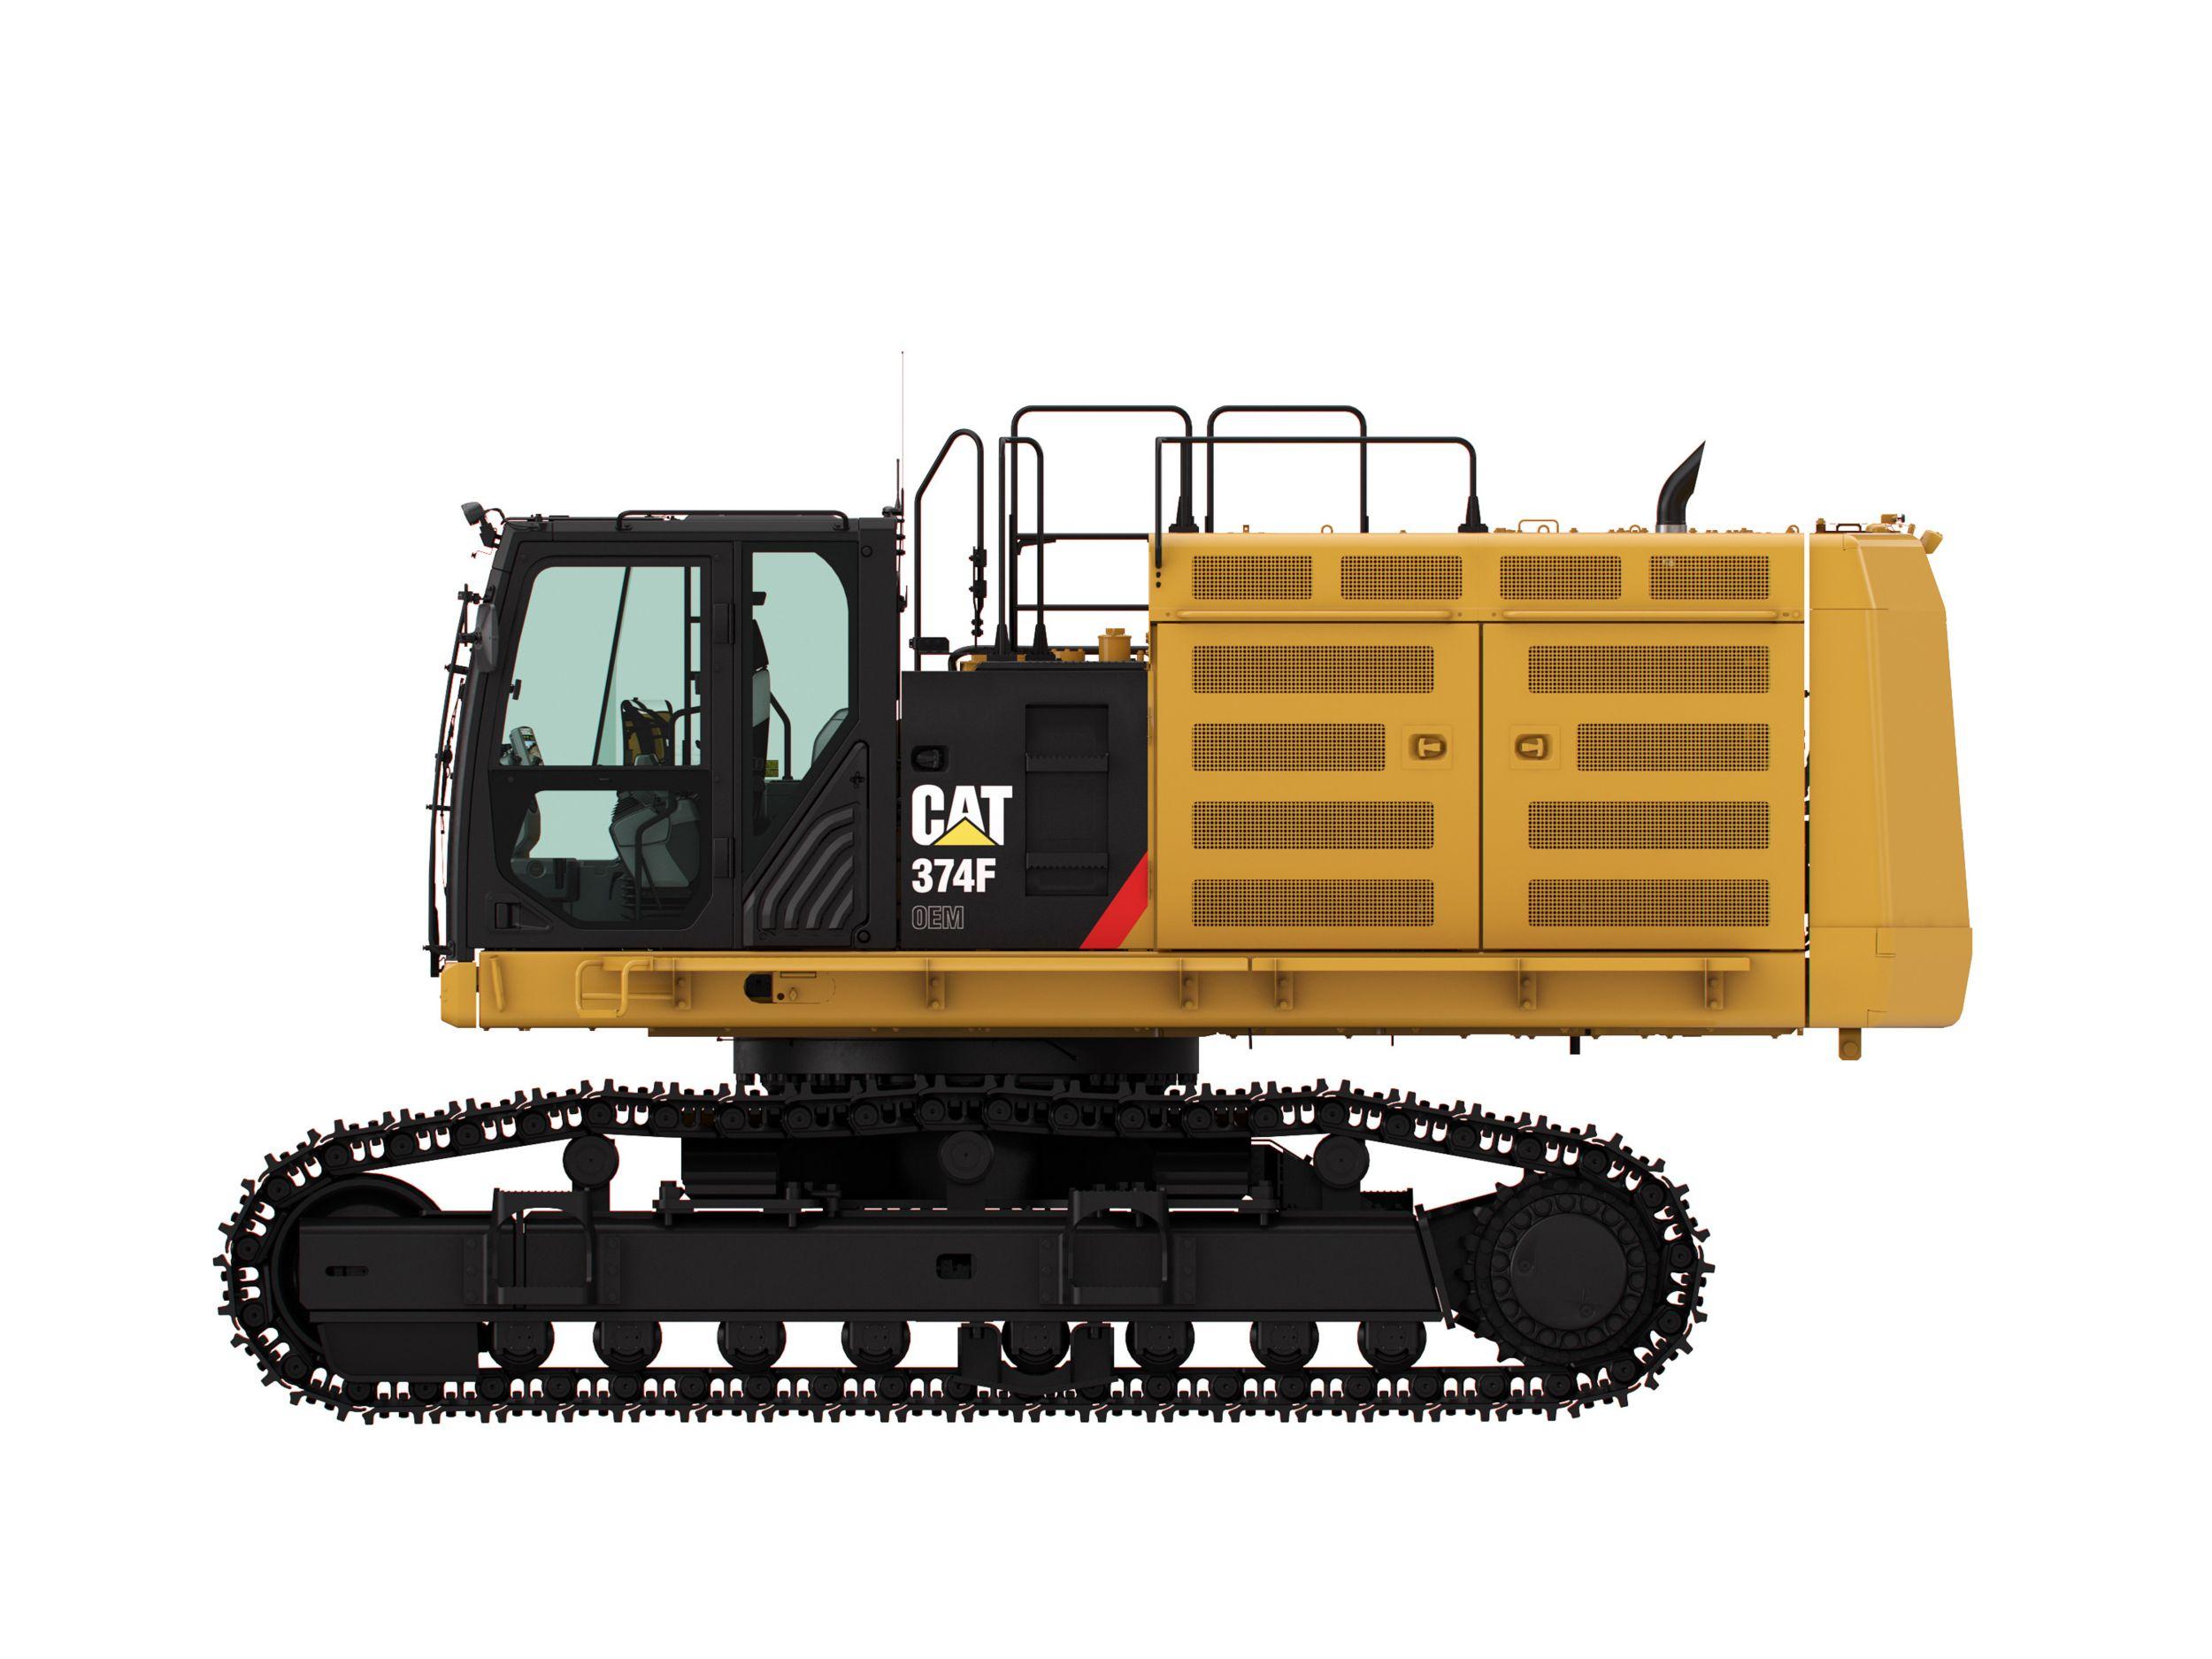 374F Frontless Excavator